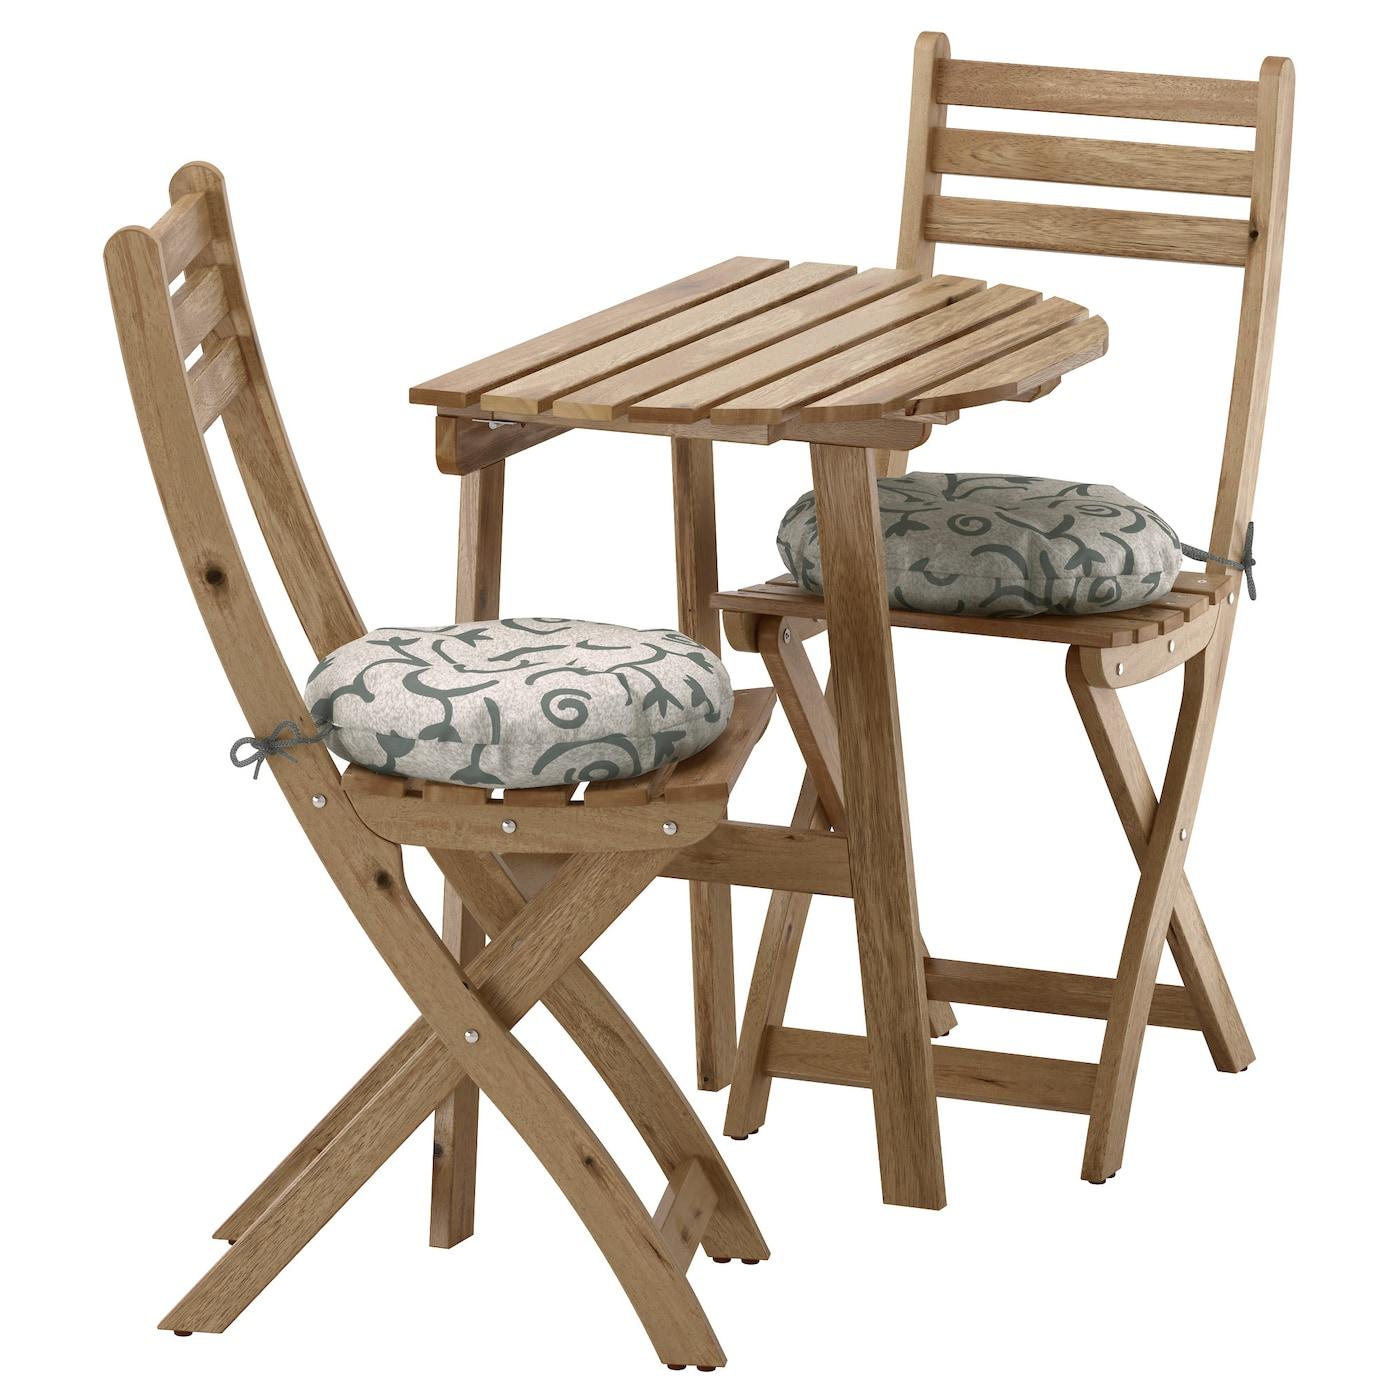 Garden Table & Chairs | IKEA Ireland - Dublin